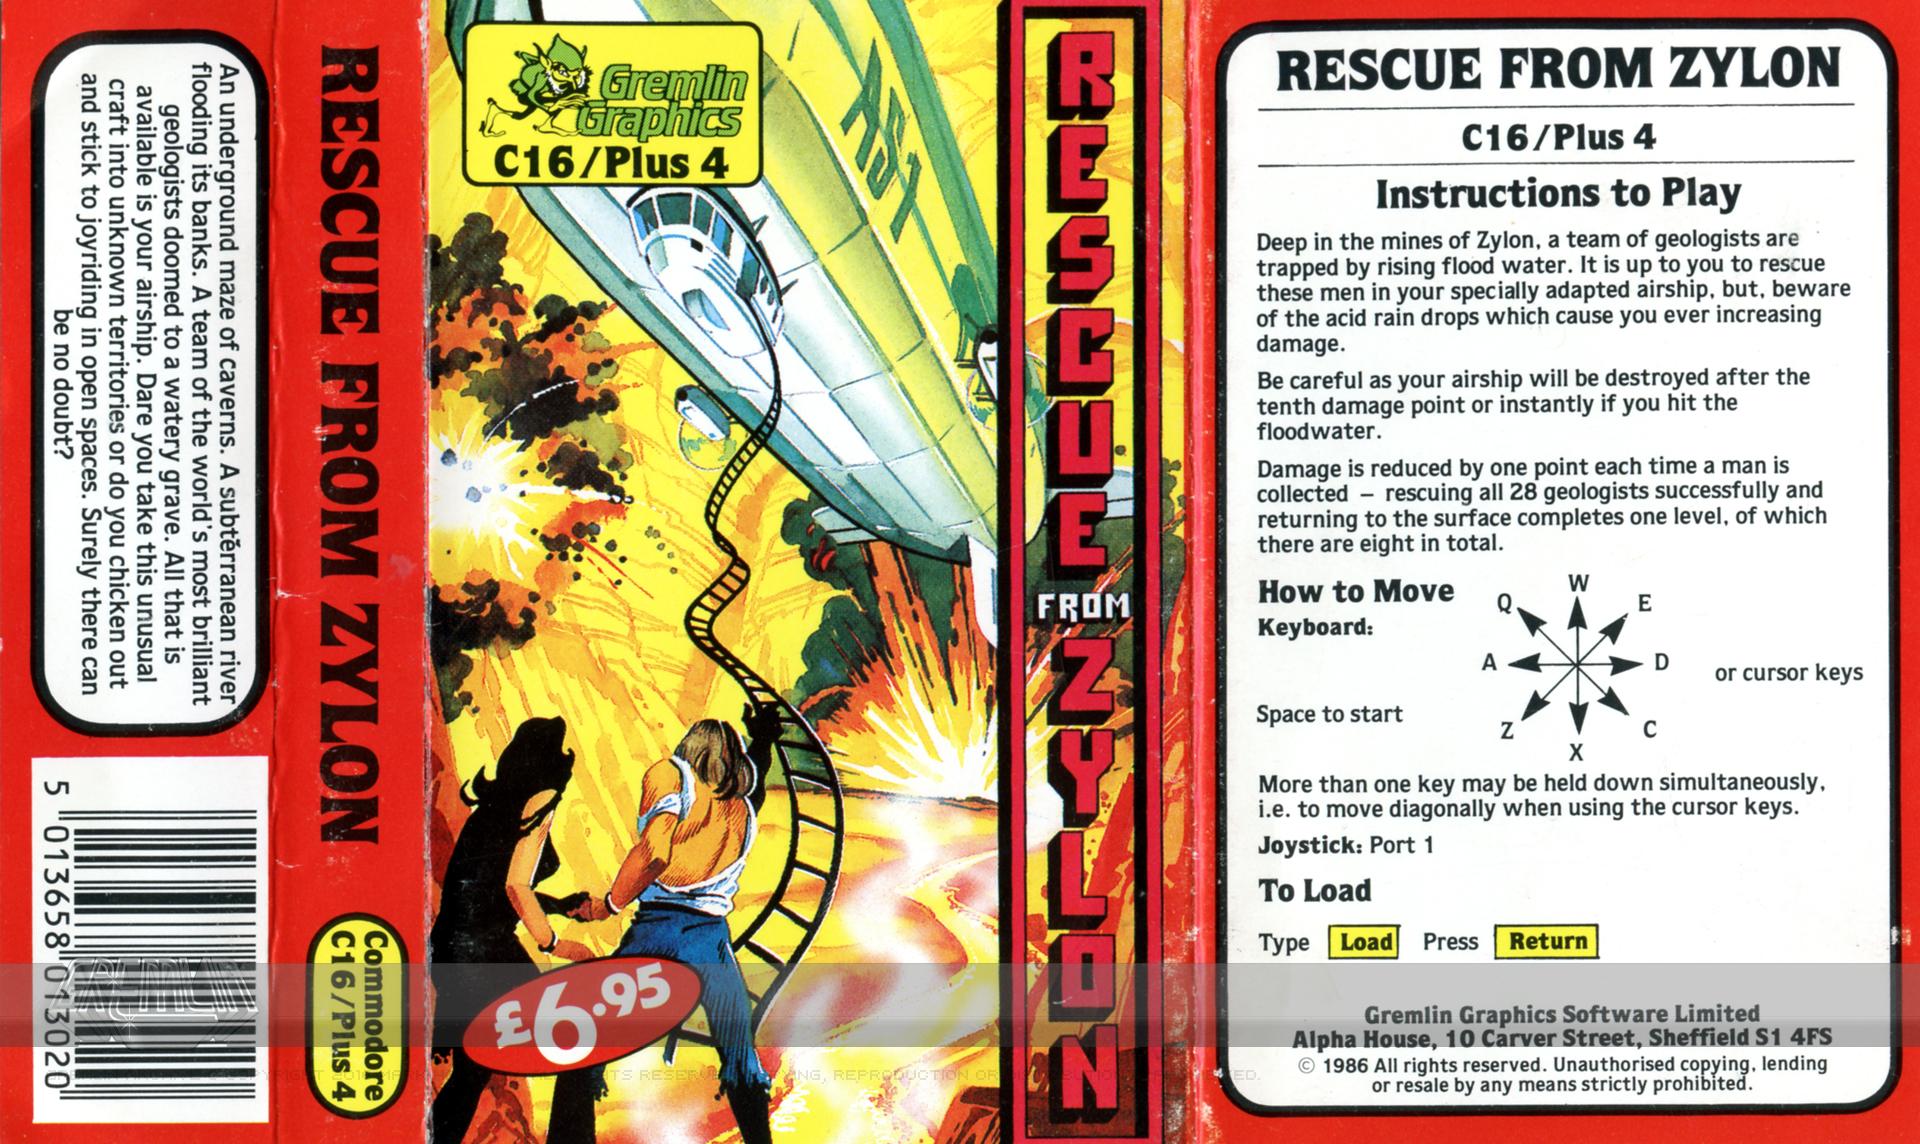 Rescue from Zylon